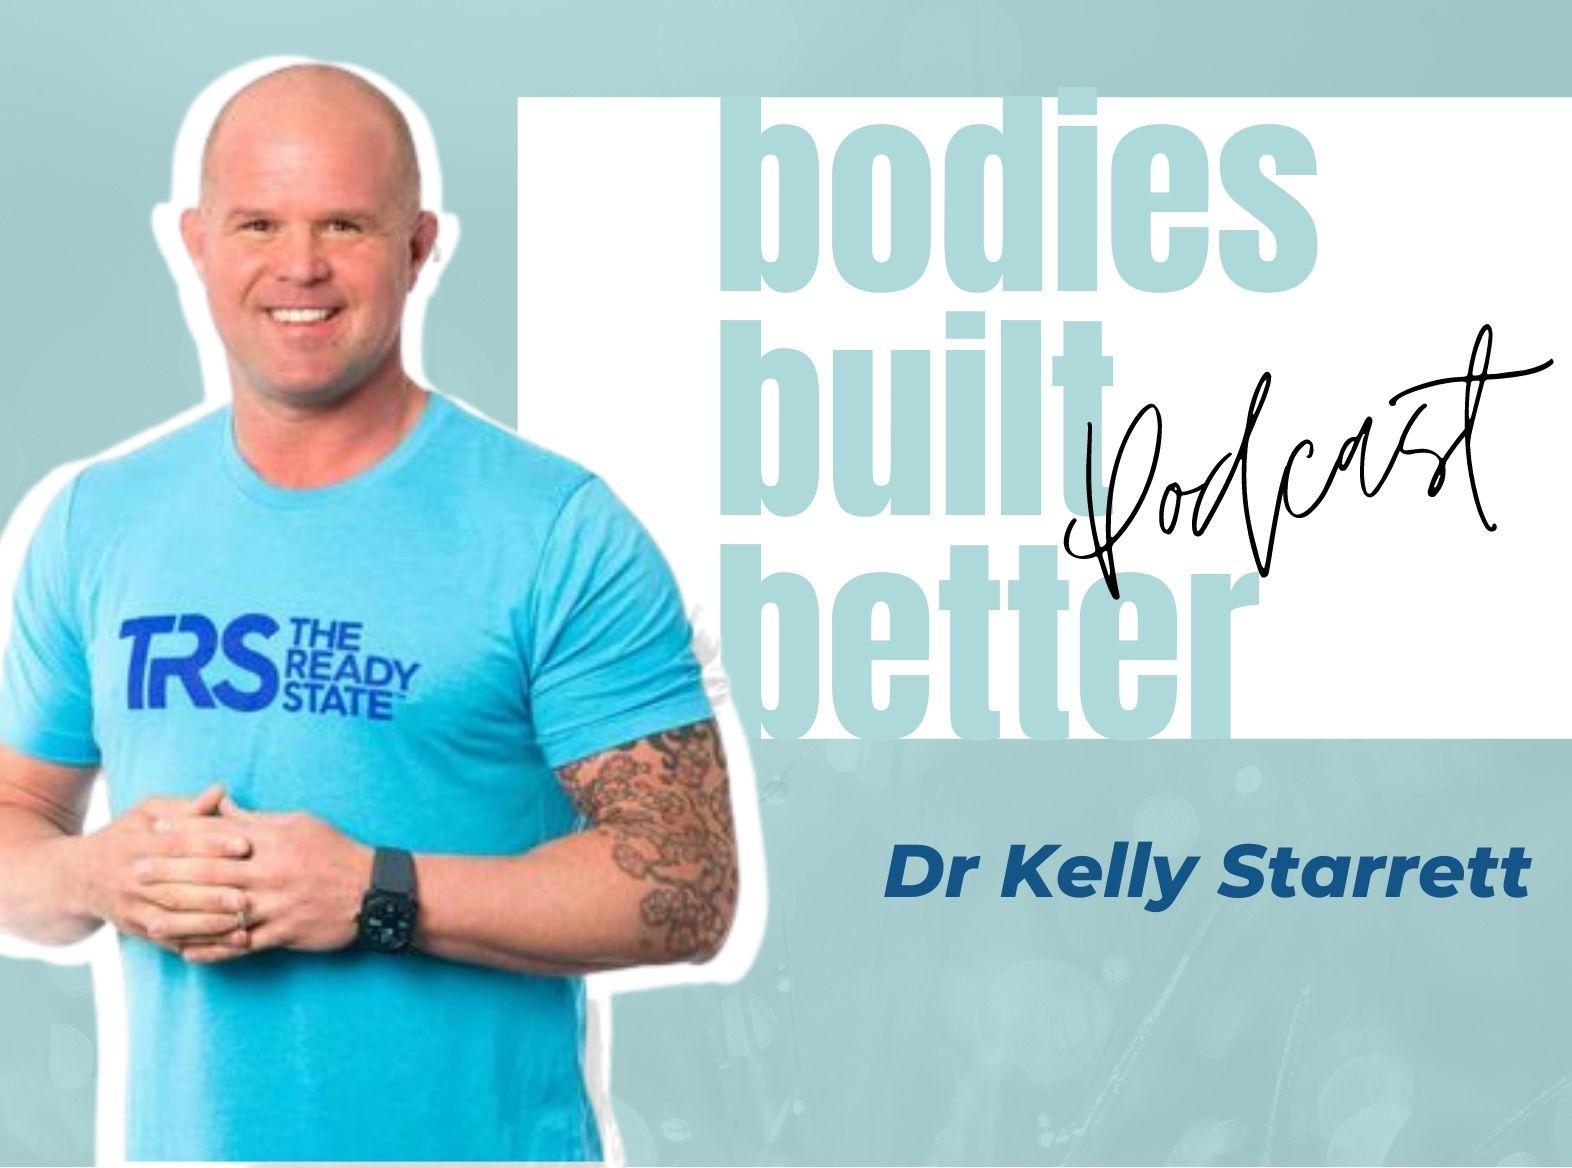 DR KELLY STARRETT